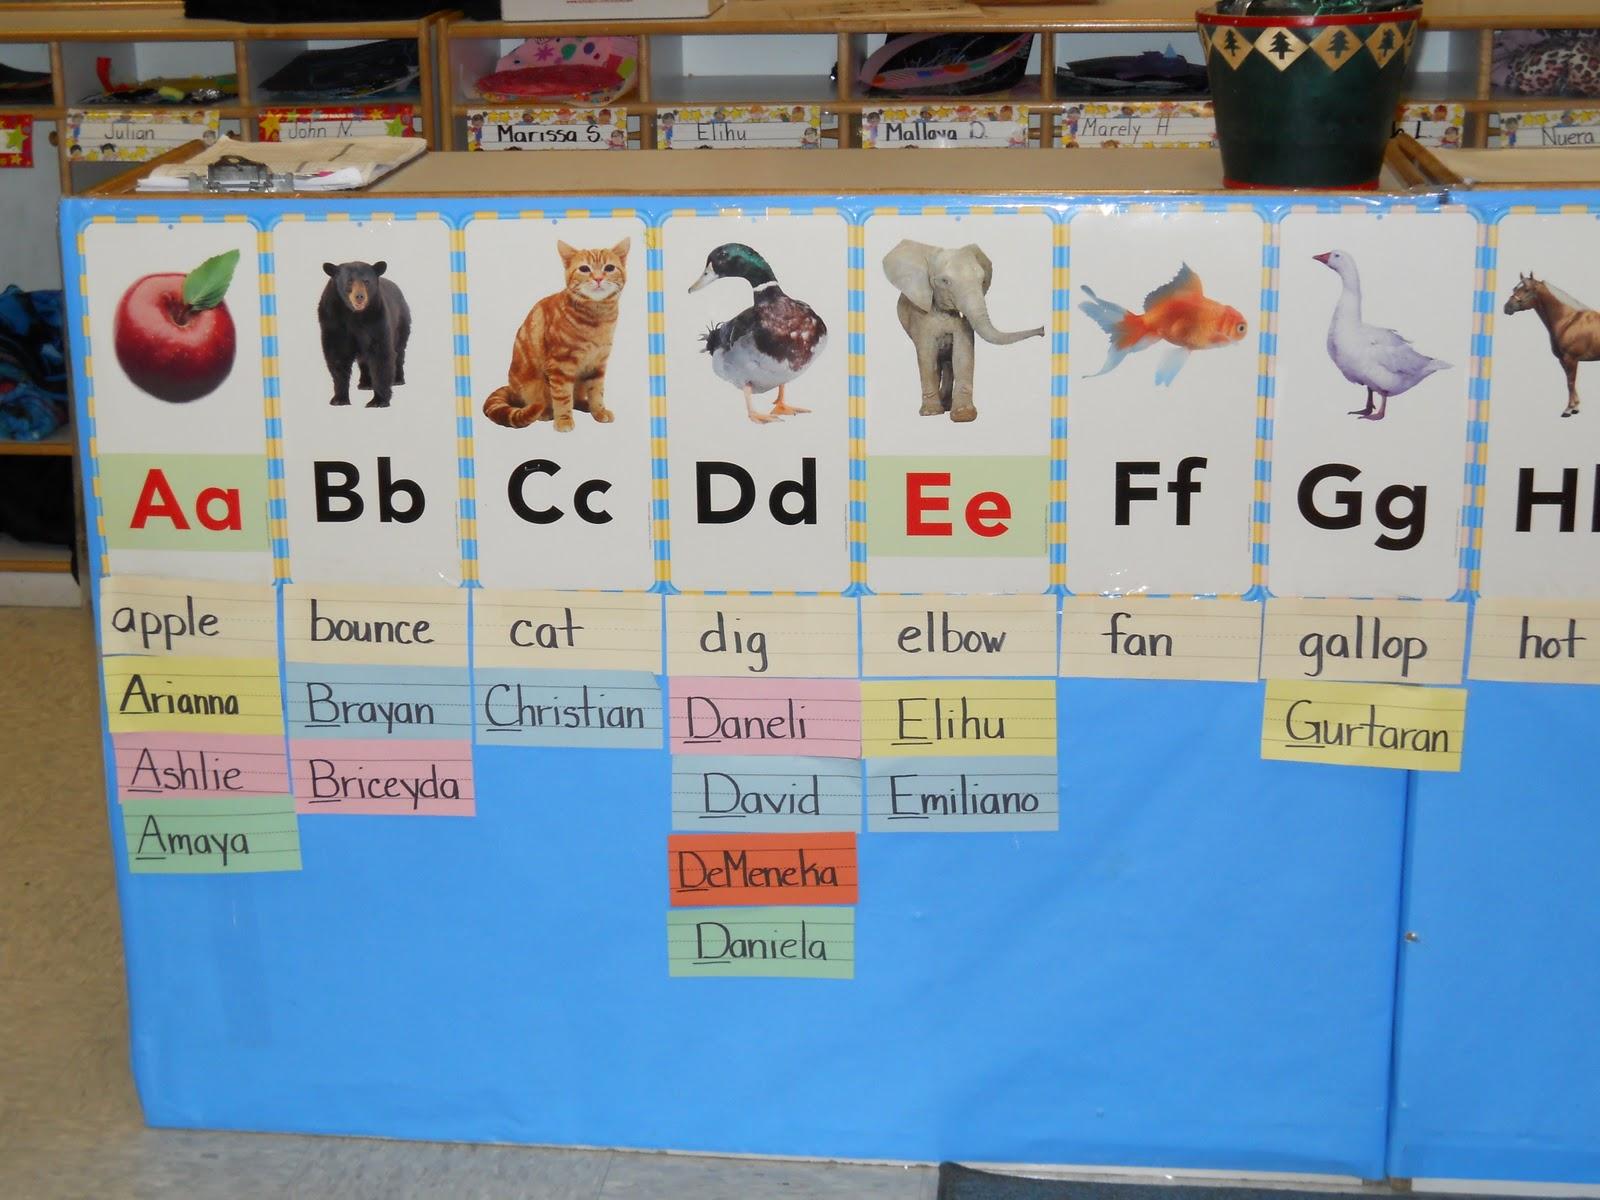 Learning And Teaching With Preschoolers Word Walls In Preschool